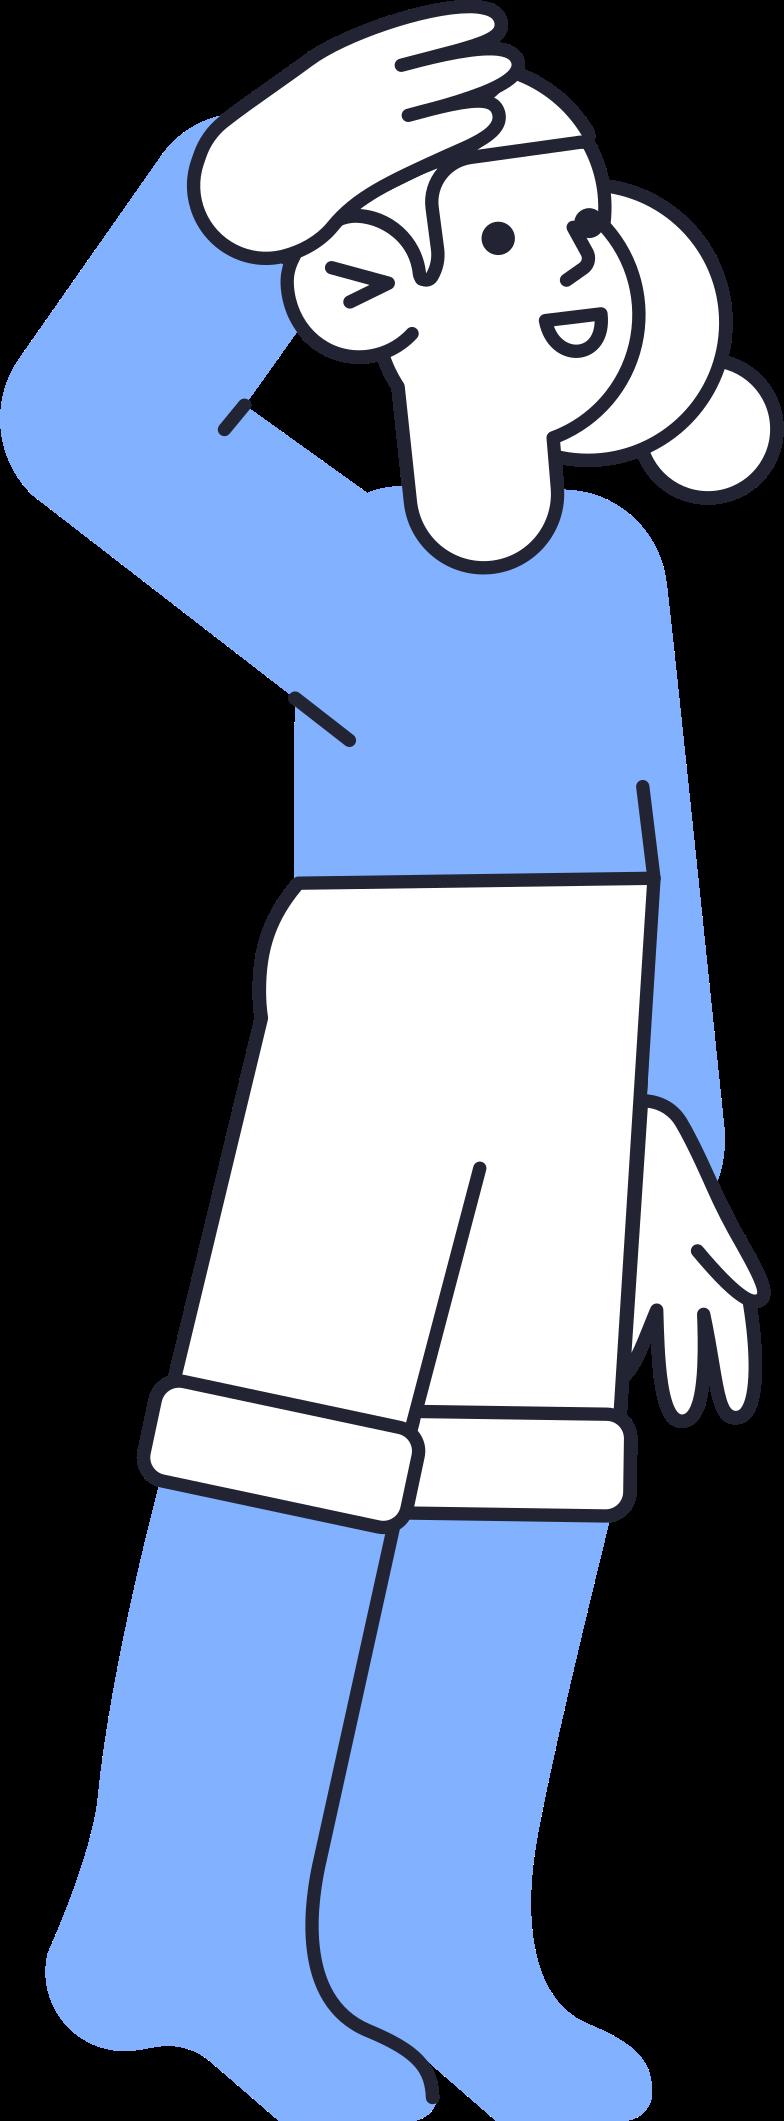 little girl Clipart illustration in PNG, SVG